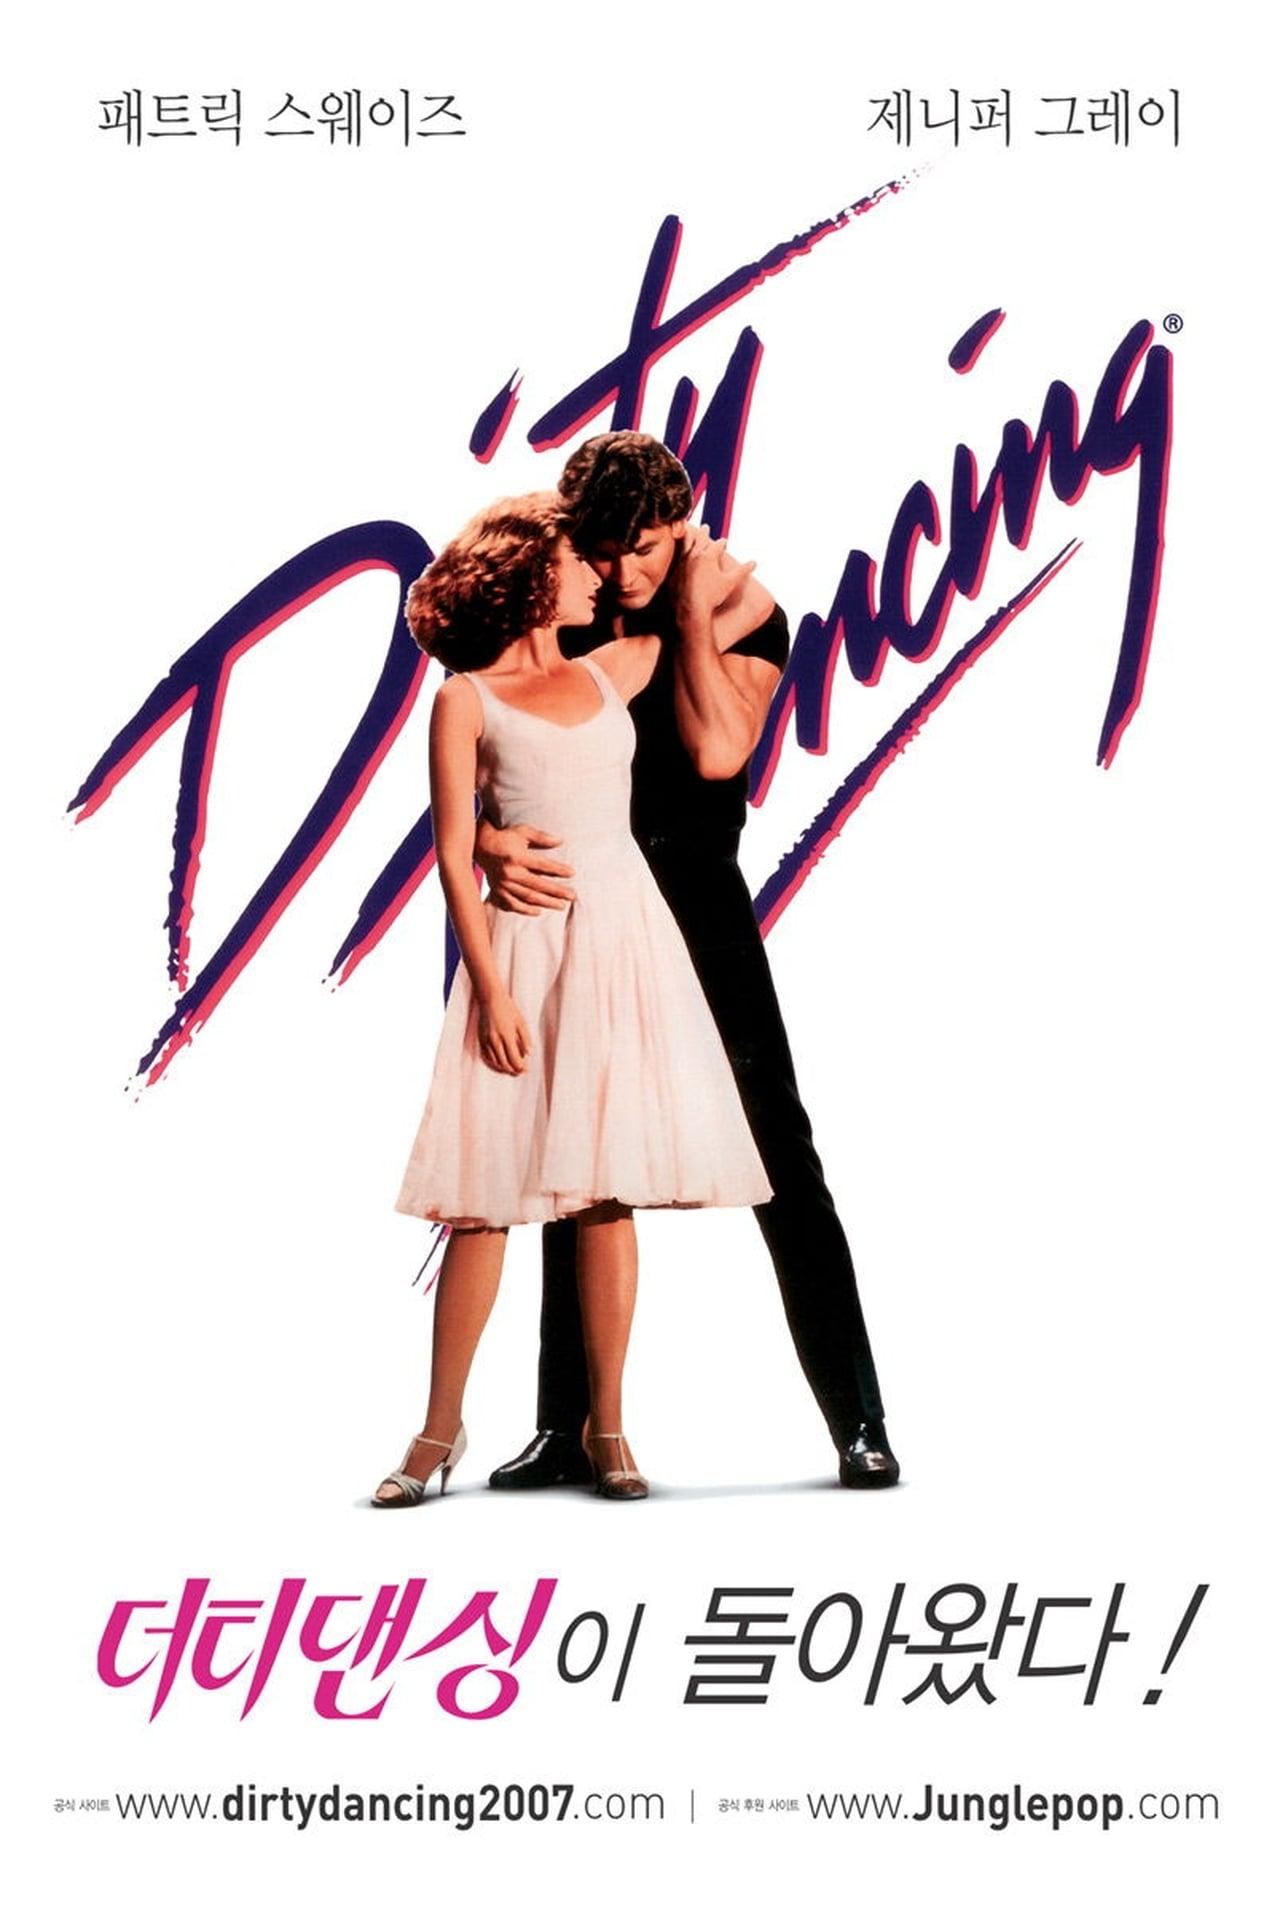 dirty dancing 1987 full movie free download